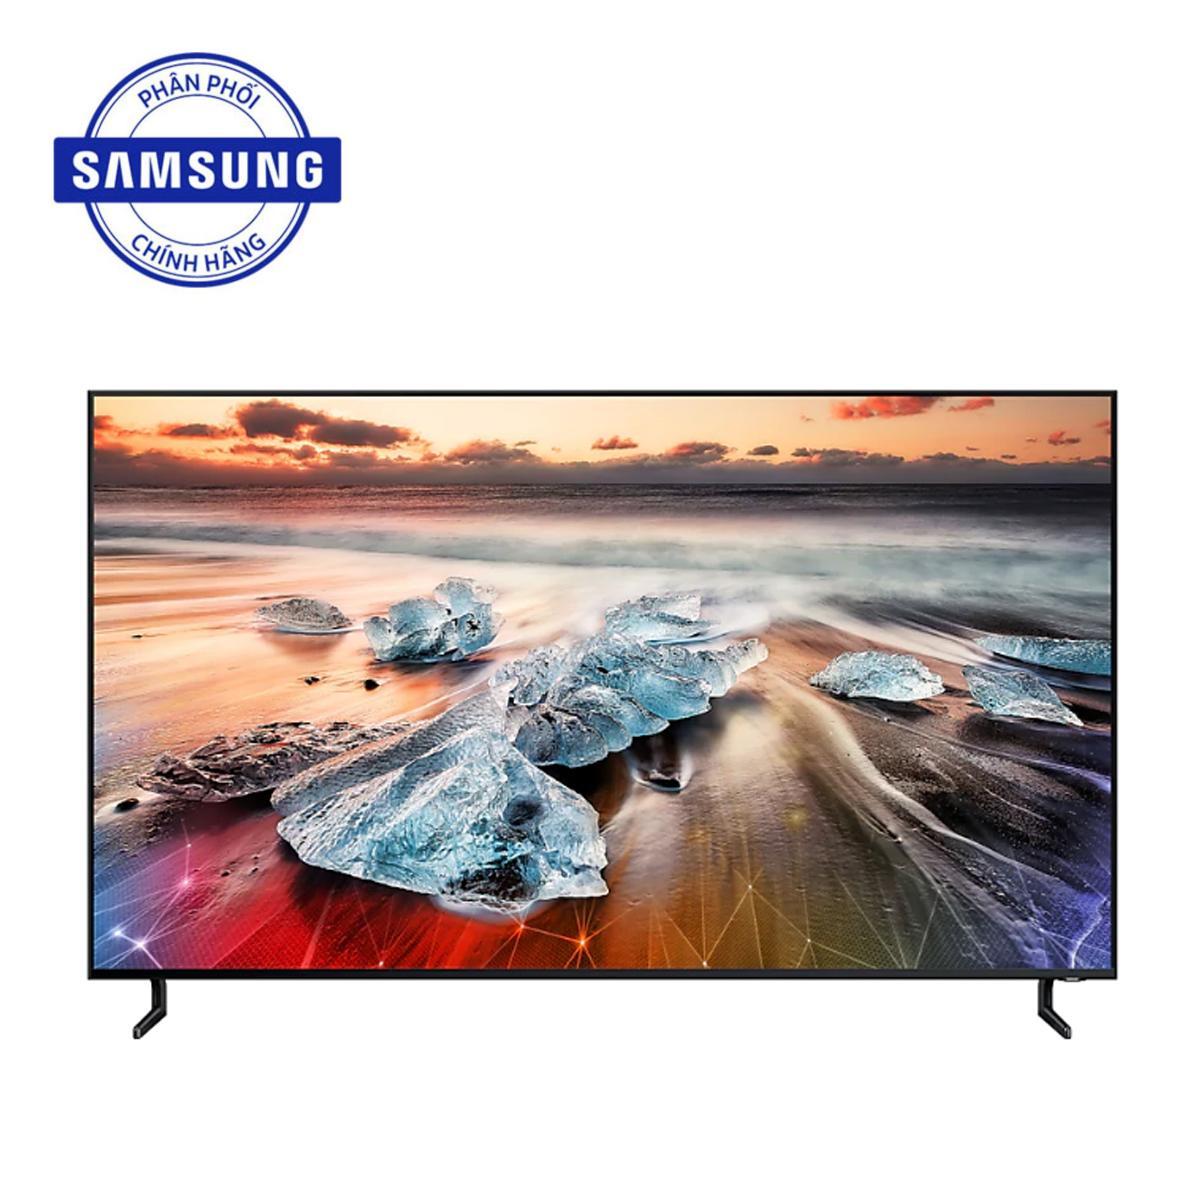 Smart TV 8K QLED 65 inch Q900R 2019